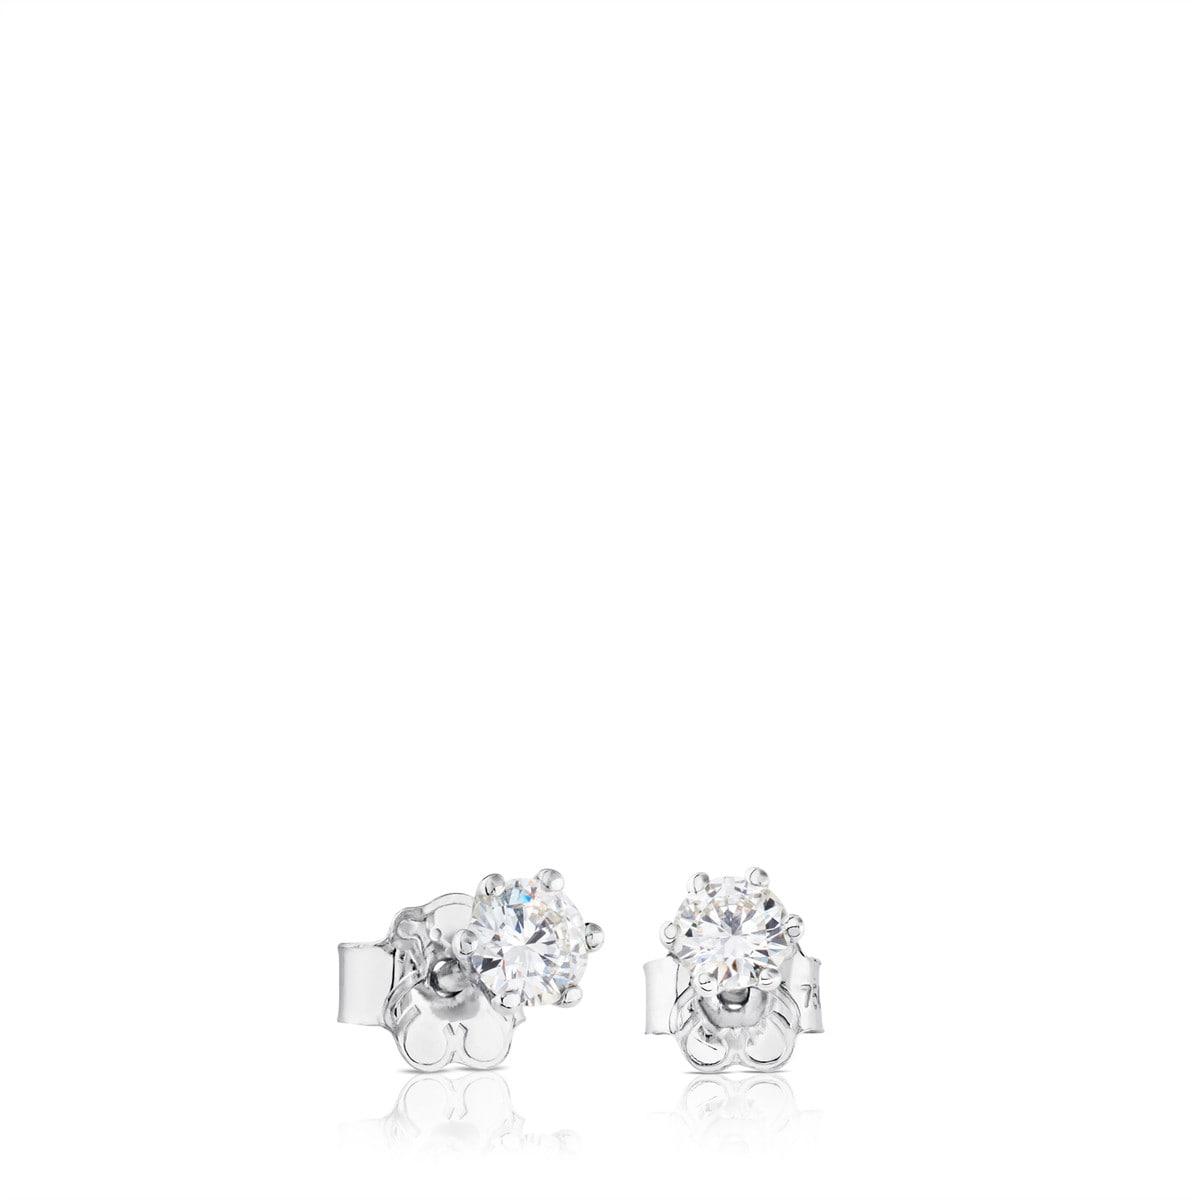 b4f836954c85 Pendientes TOUS Diamonds de Oro blanco con Diamantes - Sitio web ...